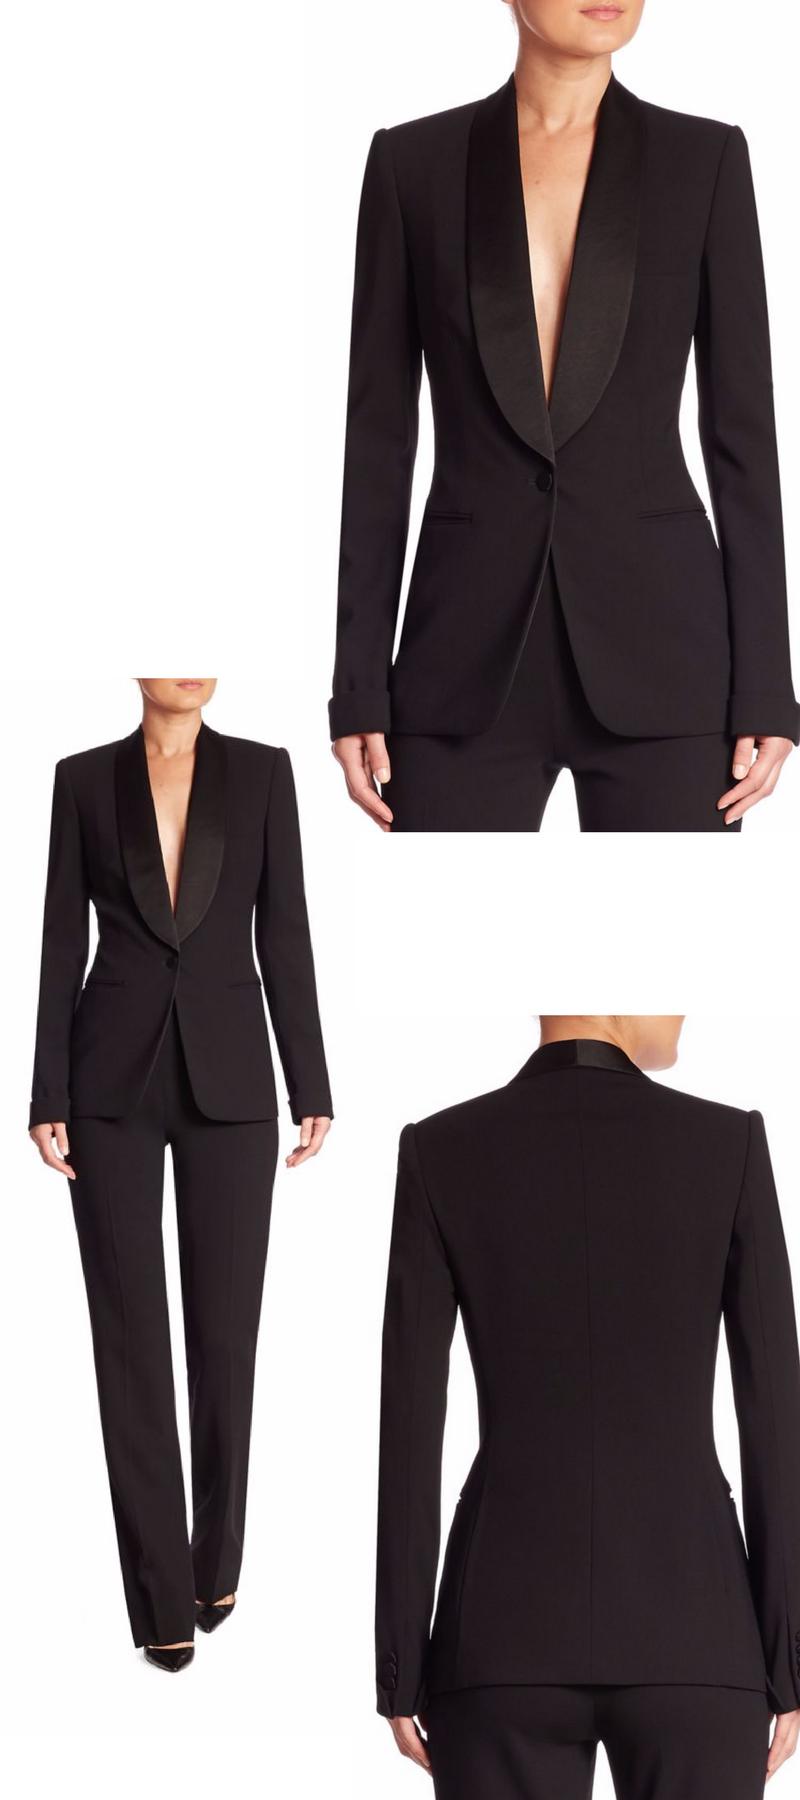 Ralph Lauren Collection Sawyer Wool & Silk Jacket Color